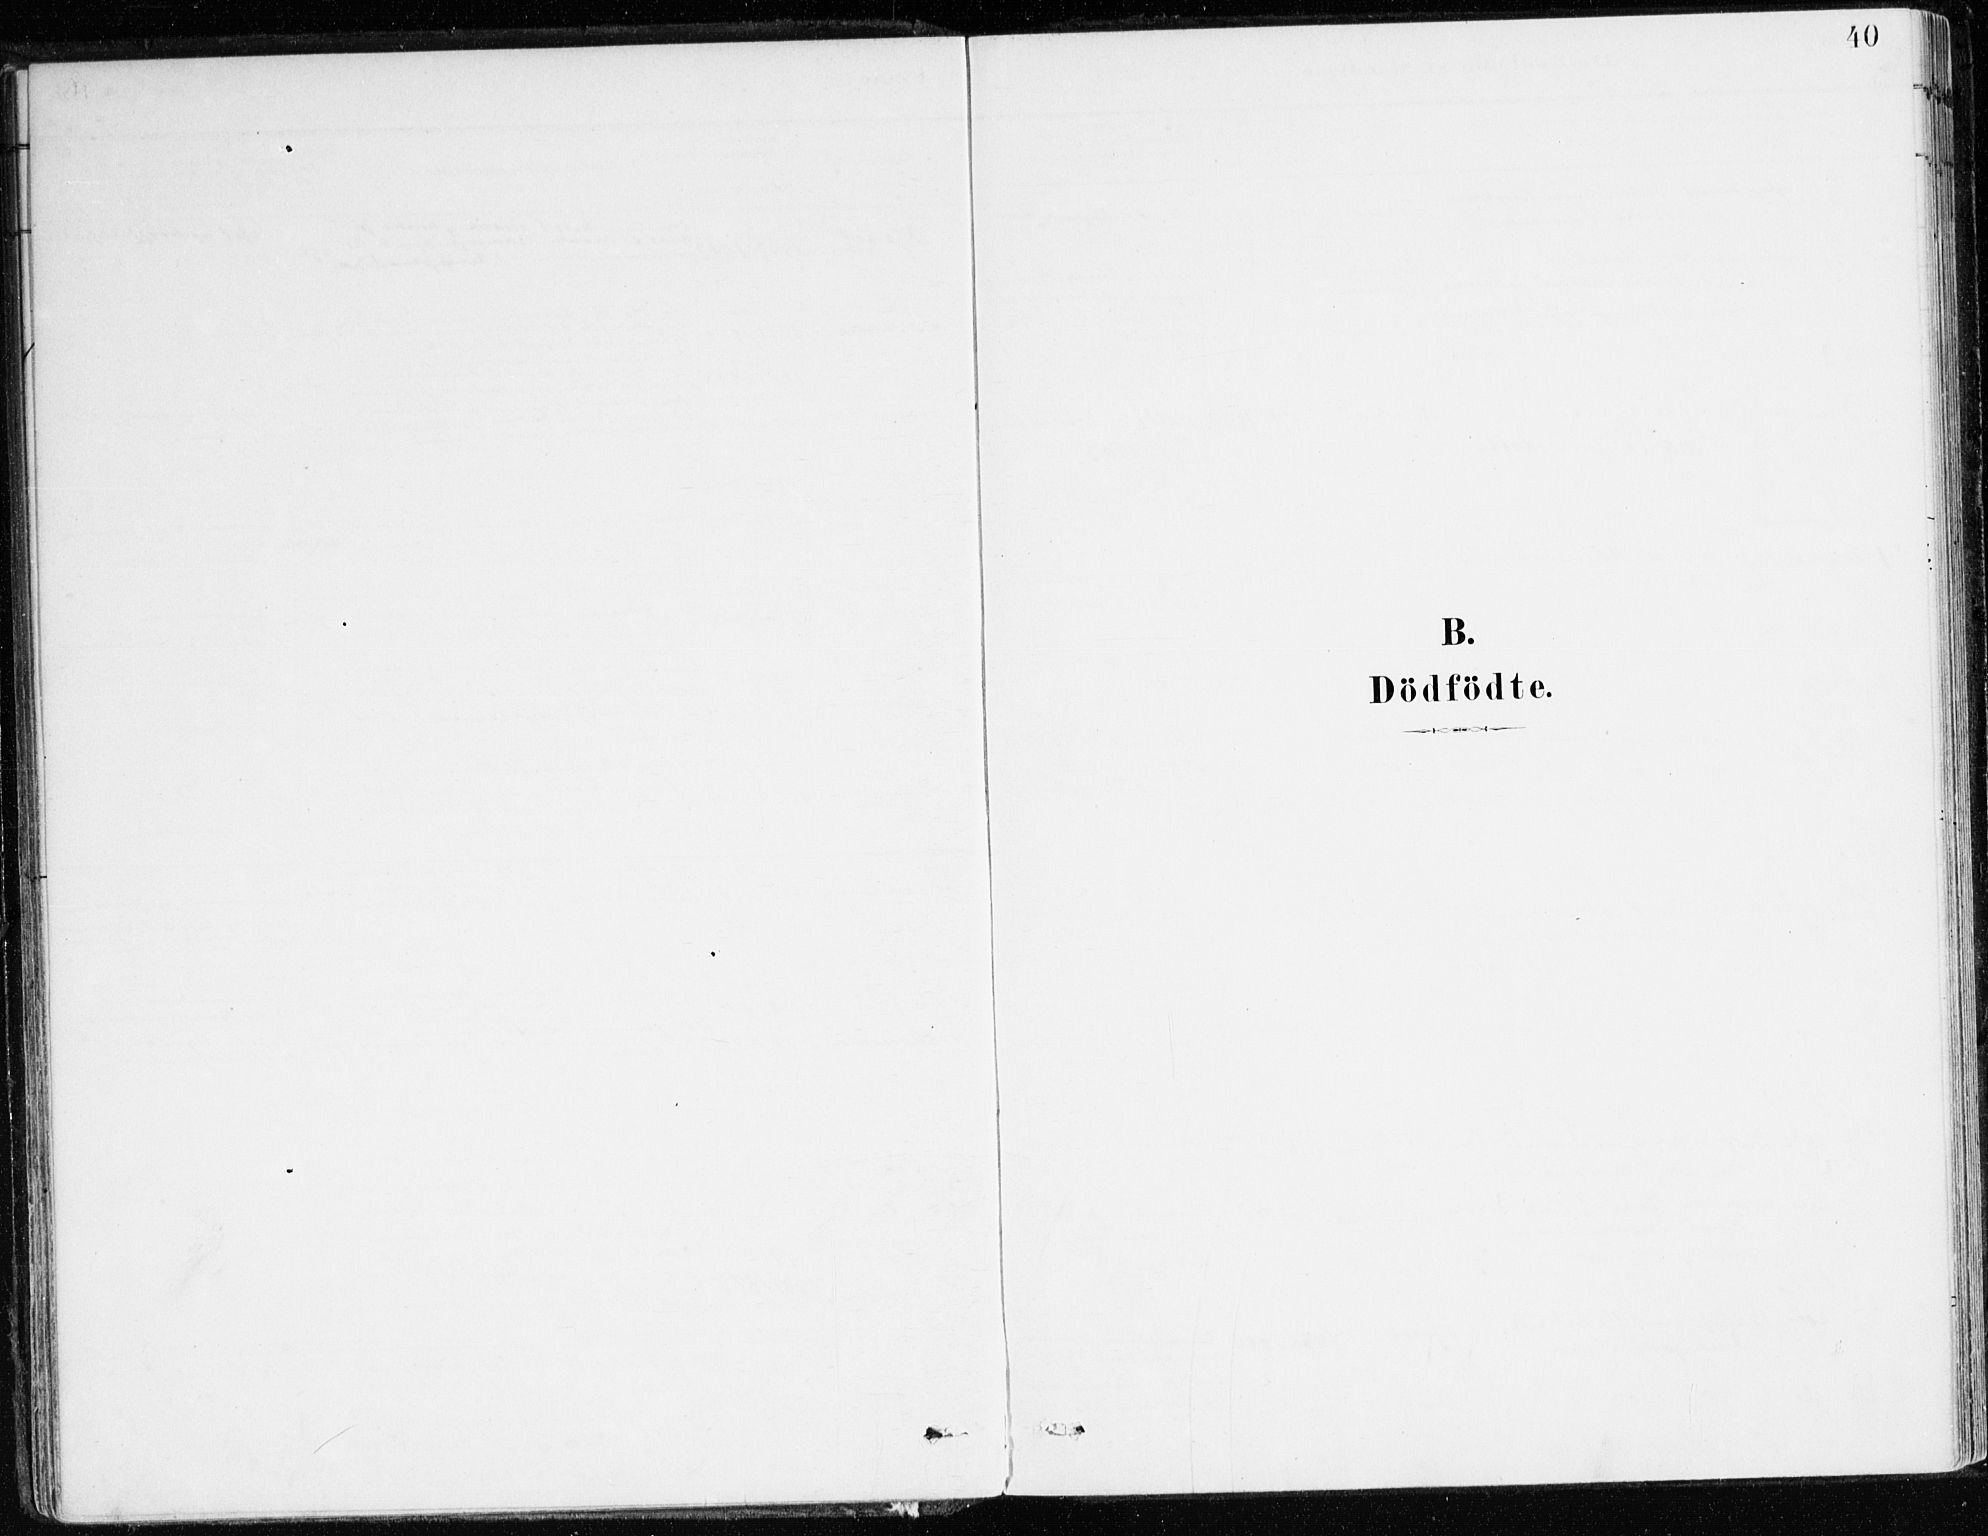 SAB, Aurland Sokneprestembete*, Ministerialbok nr. C 1, 1880-1921, s. 40